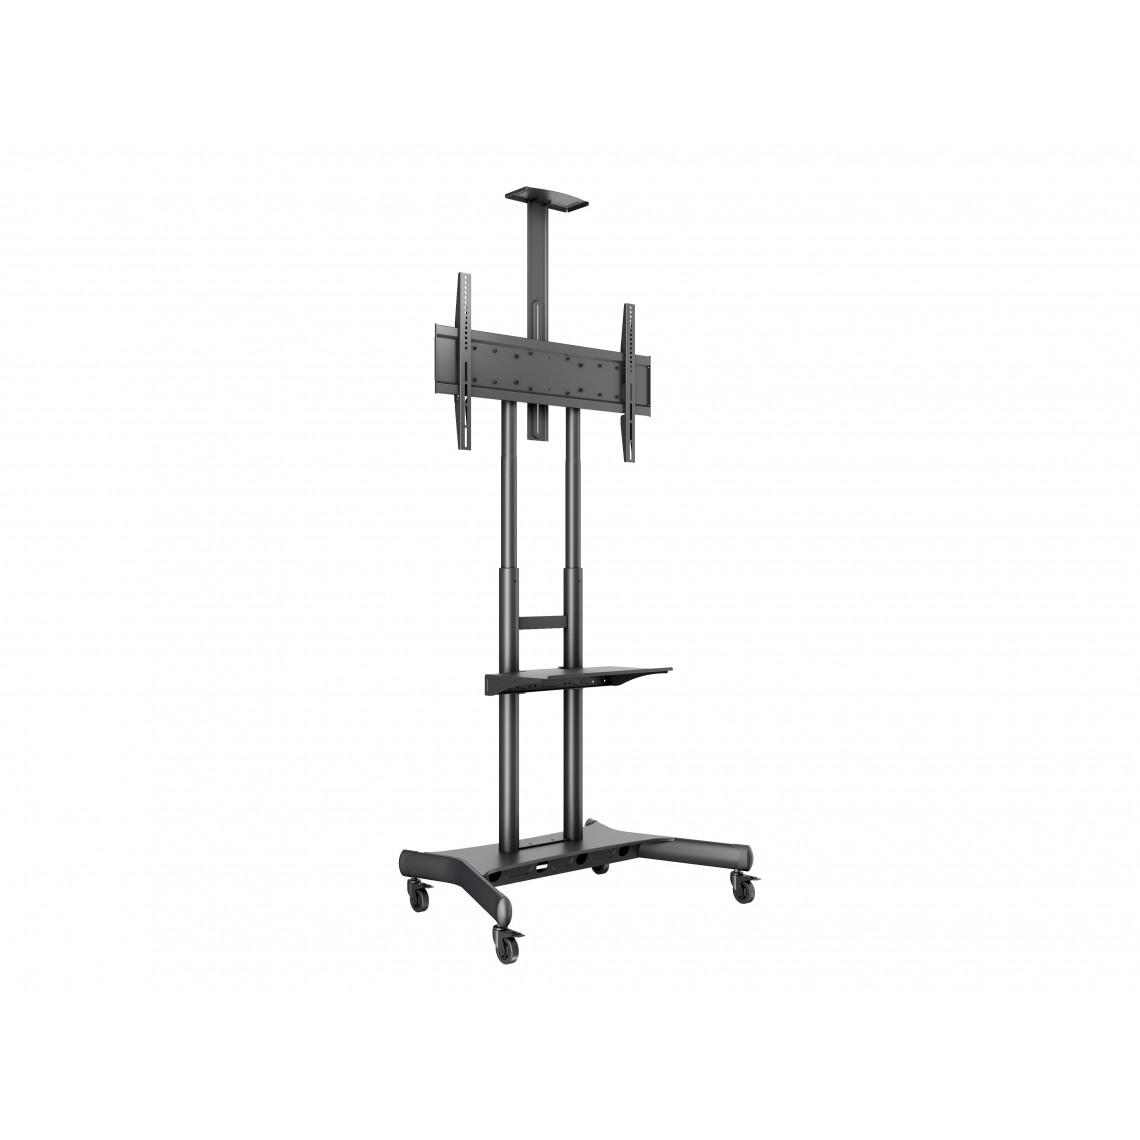 M Public Floorstand Basic 180 incl shelf & camera holder